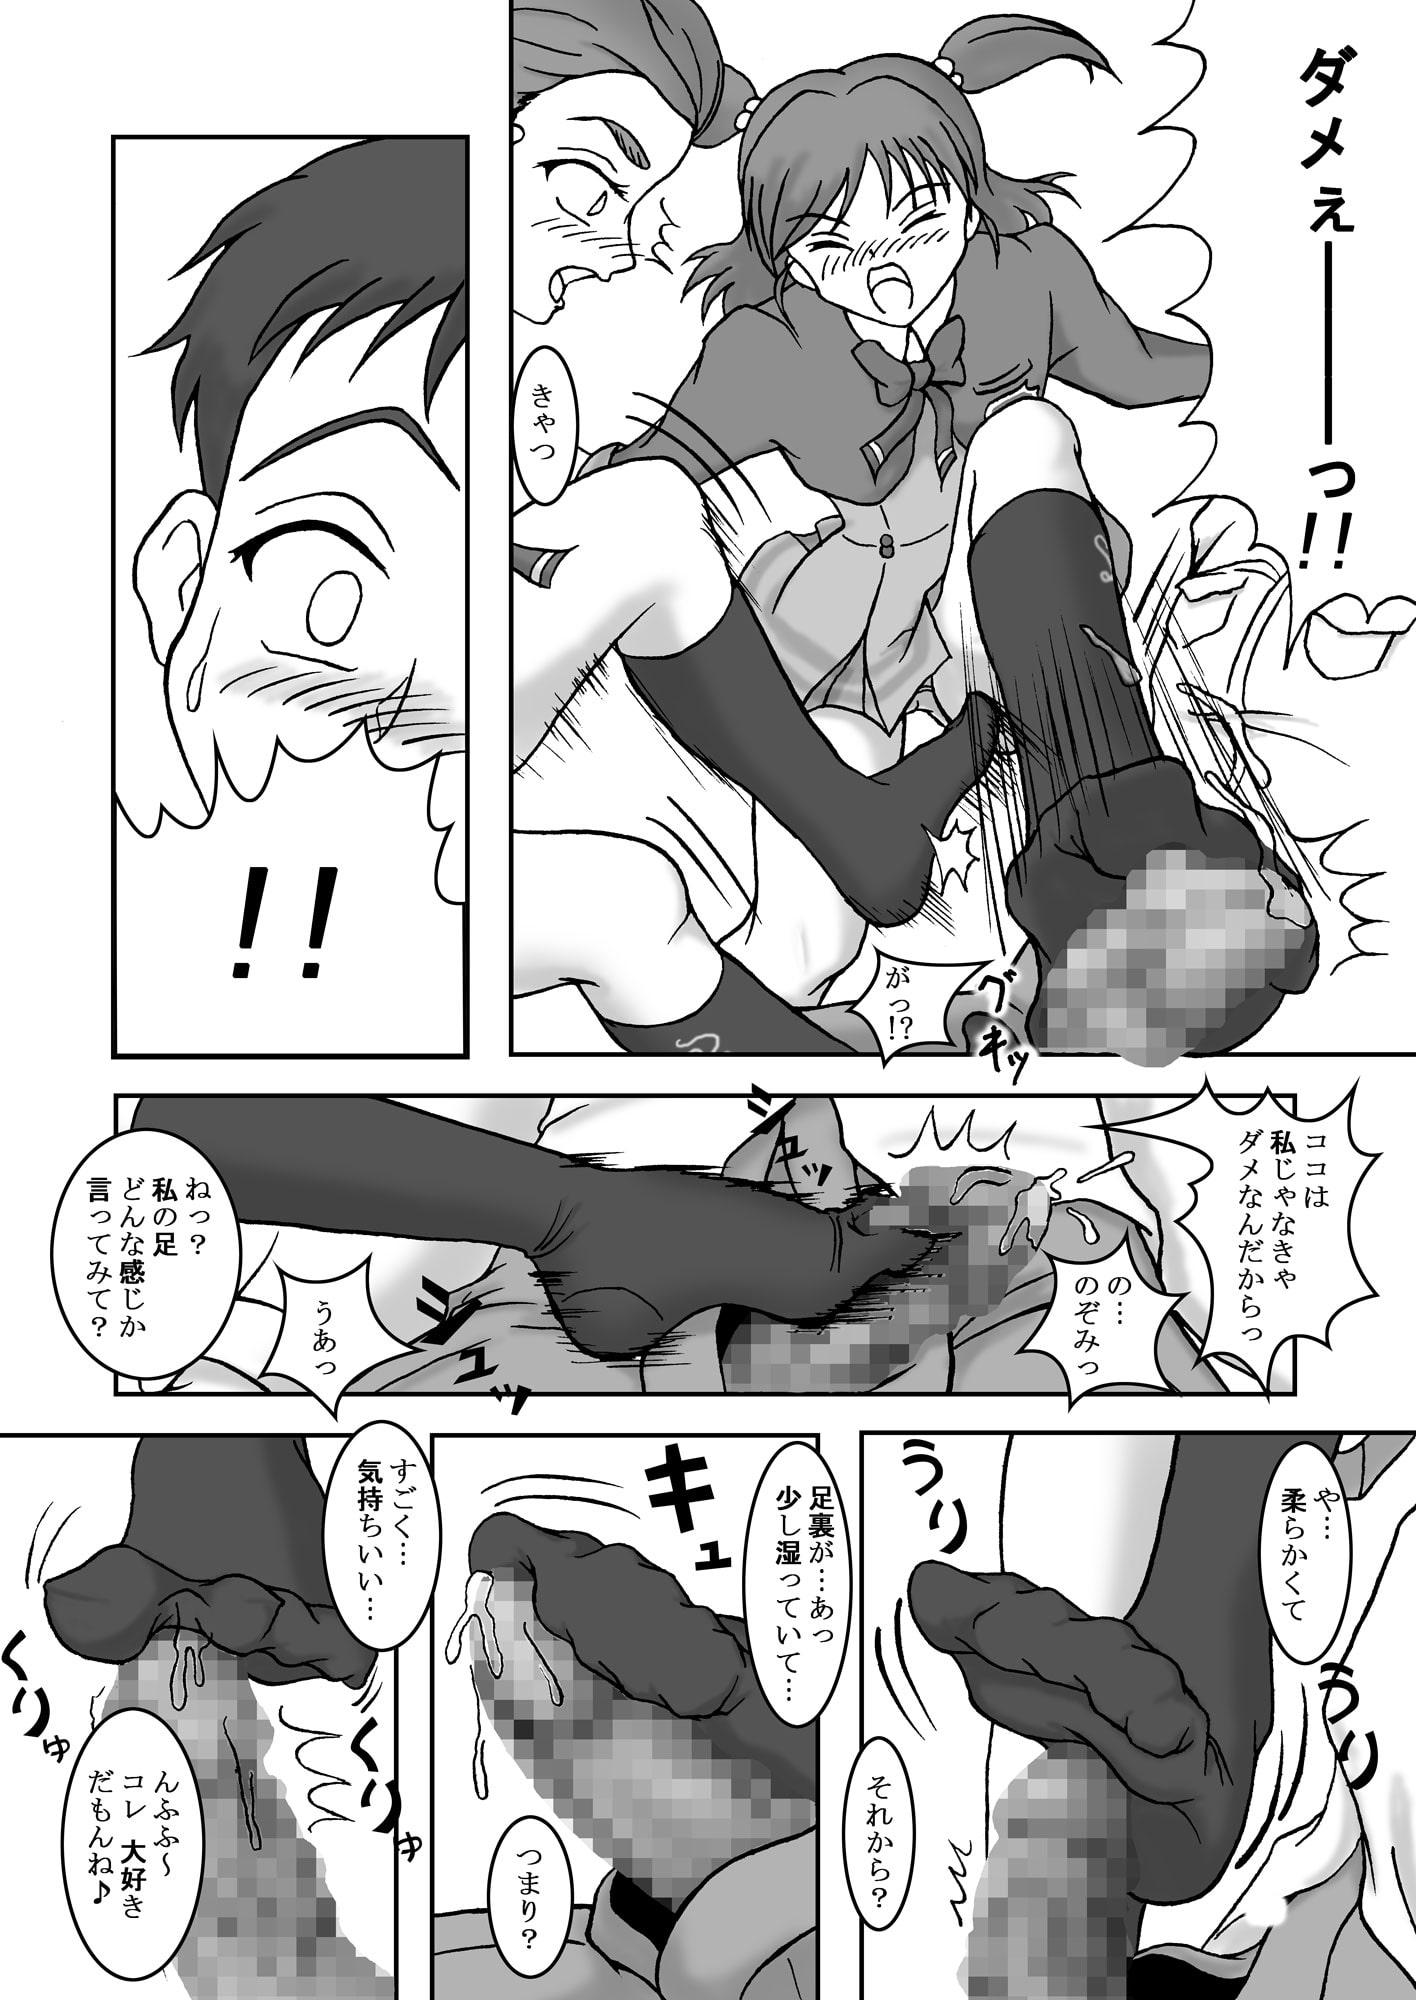 Yes!ズリキュア5GoGo!